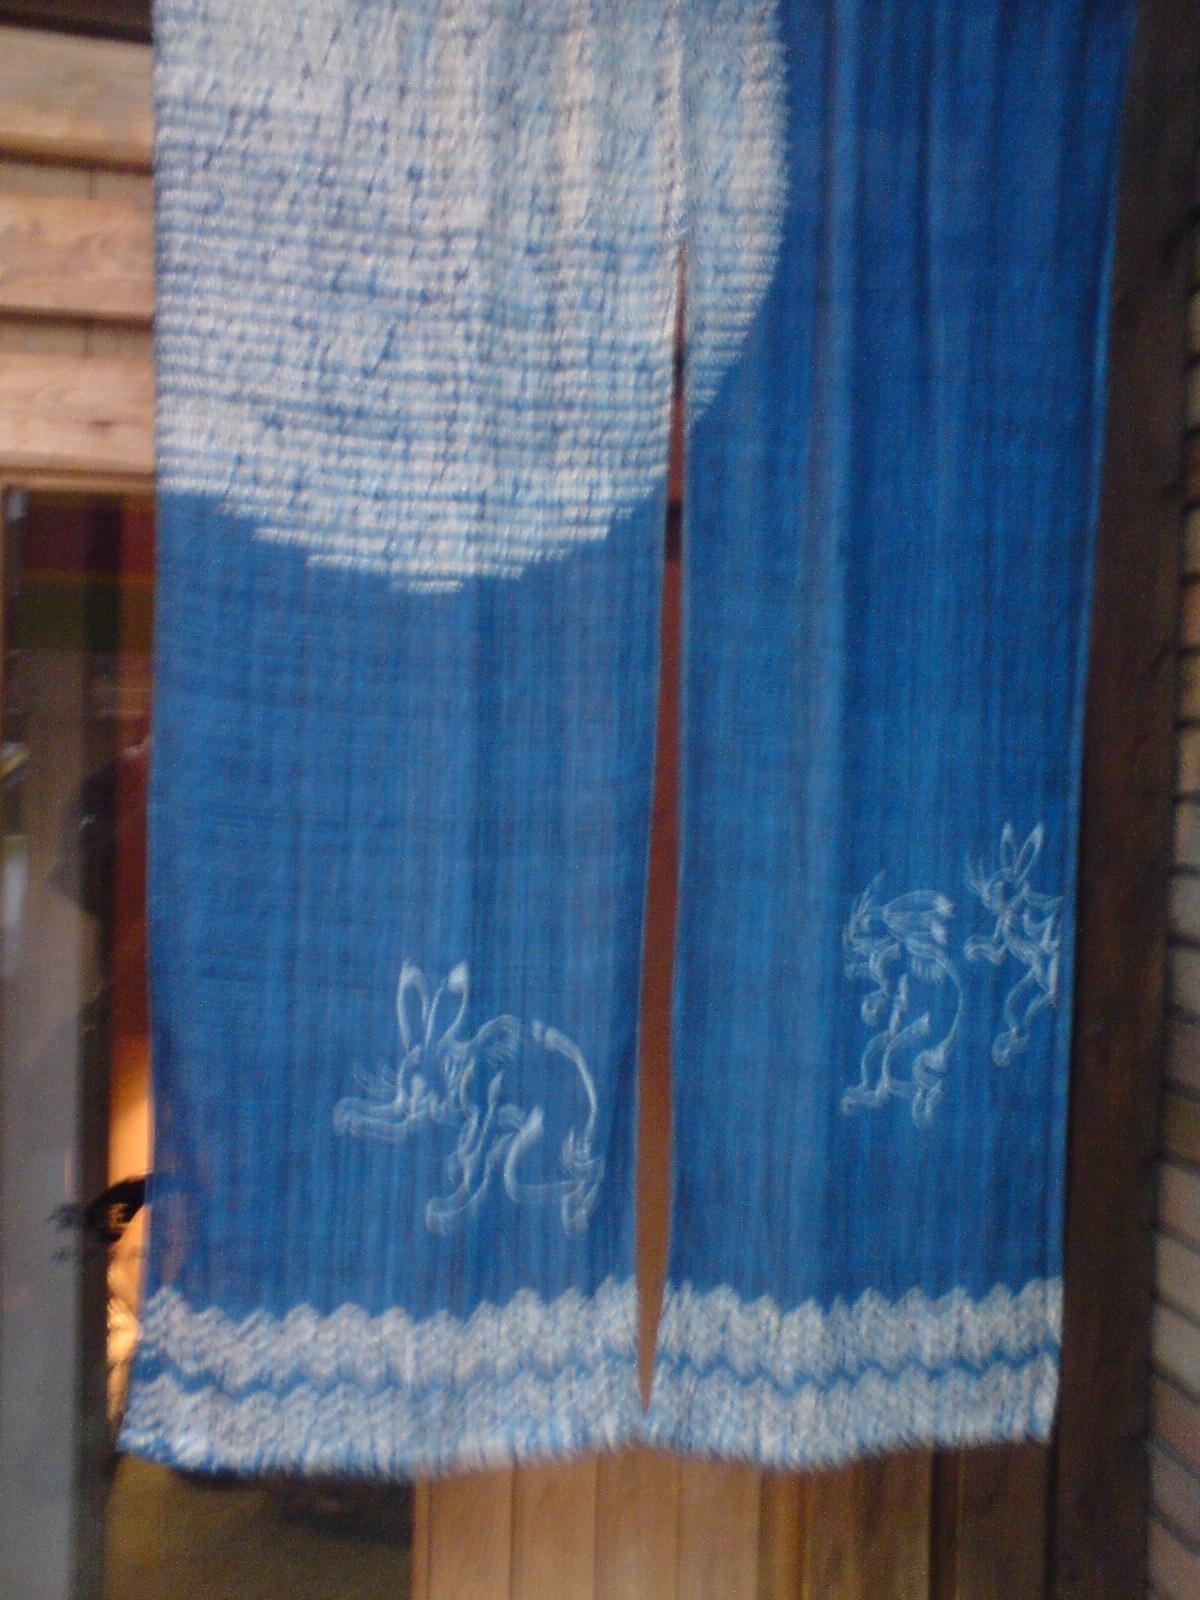 Noren ƚ�簾 Shop Curtains A Japanese Tradition 1~3